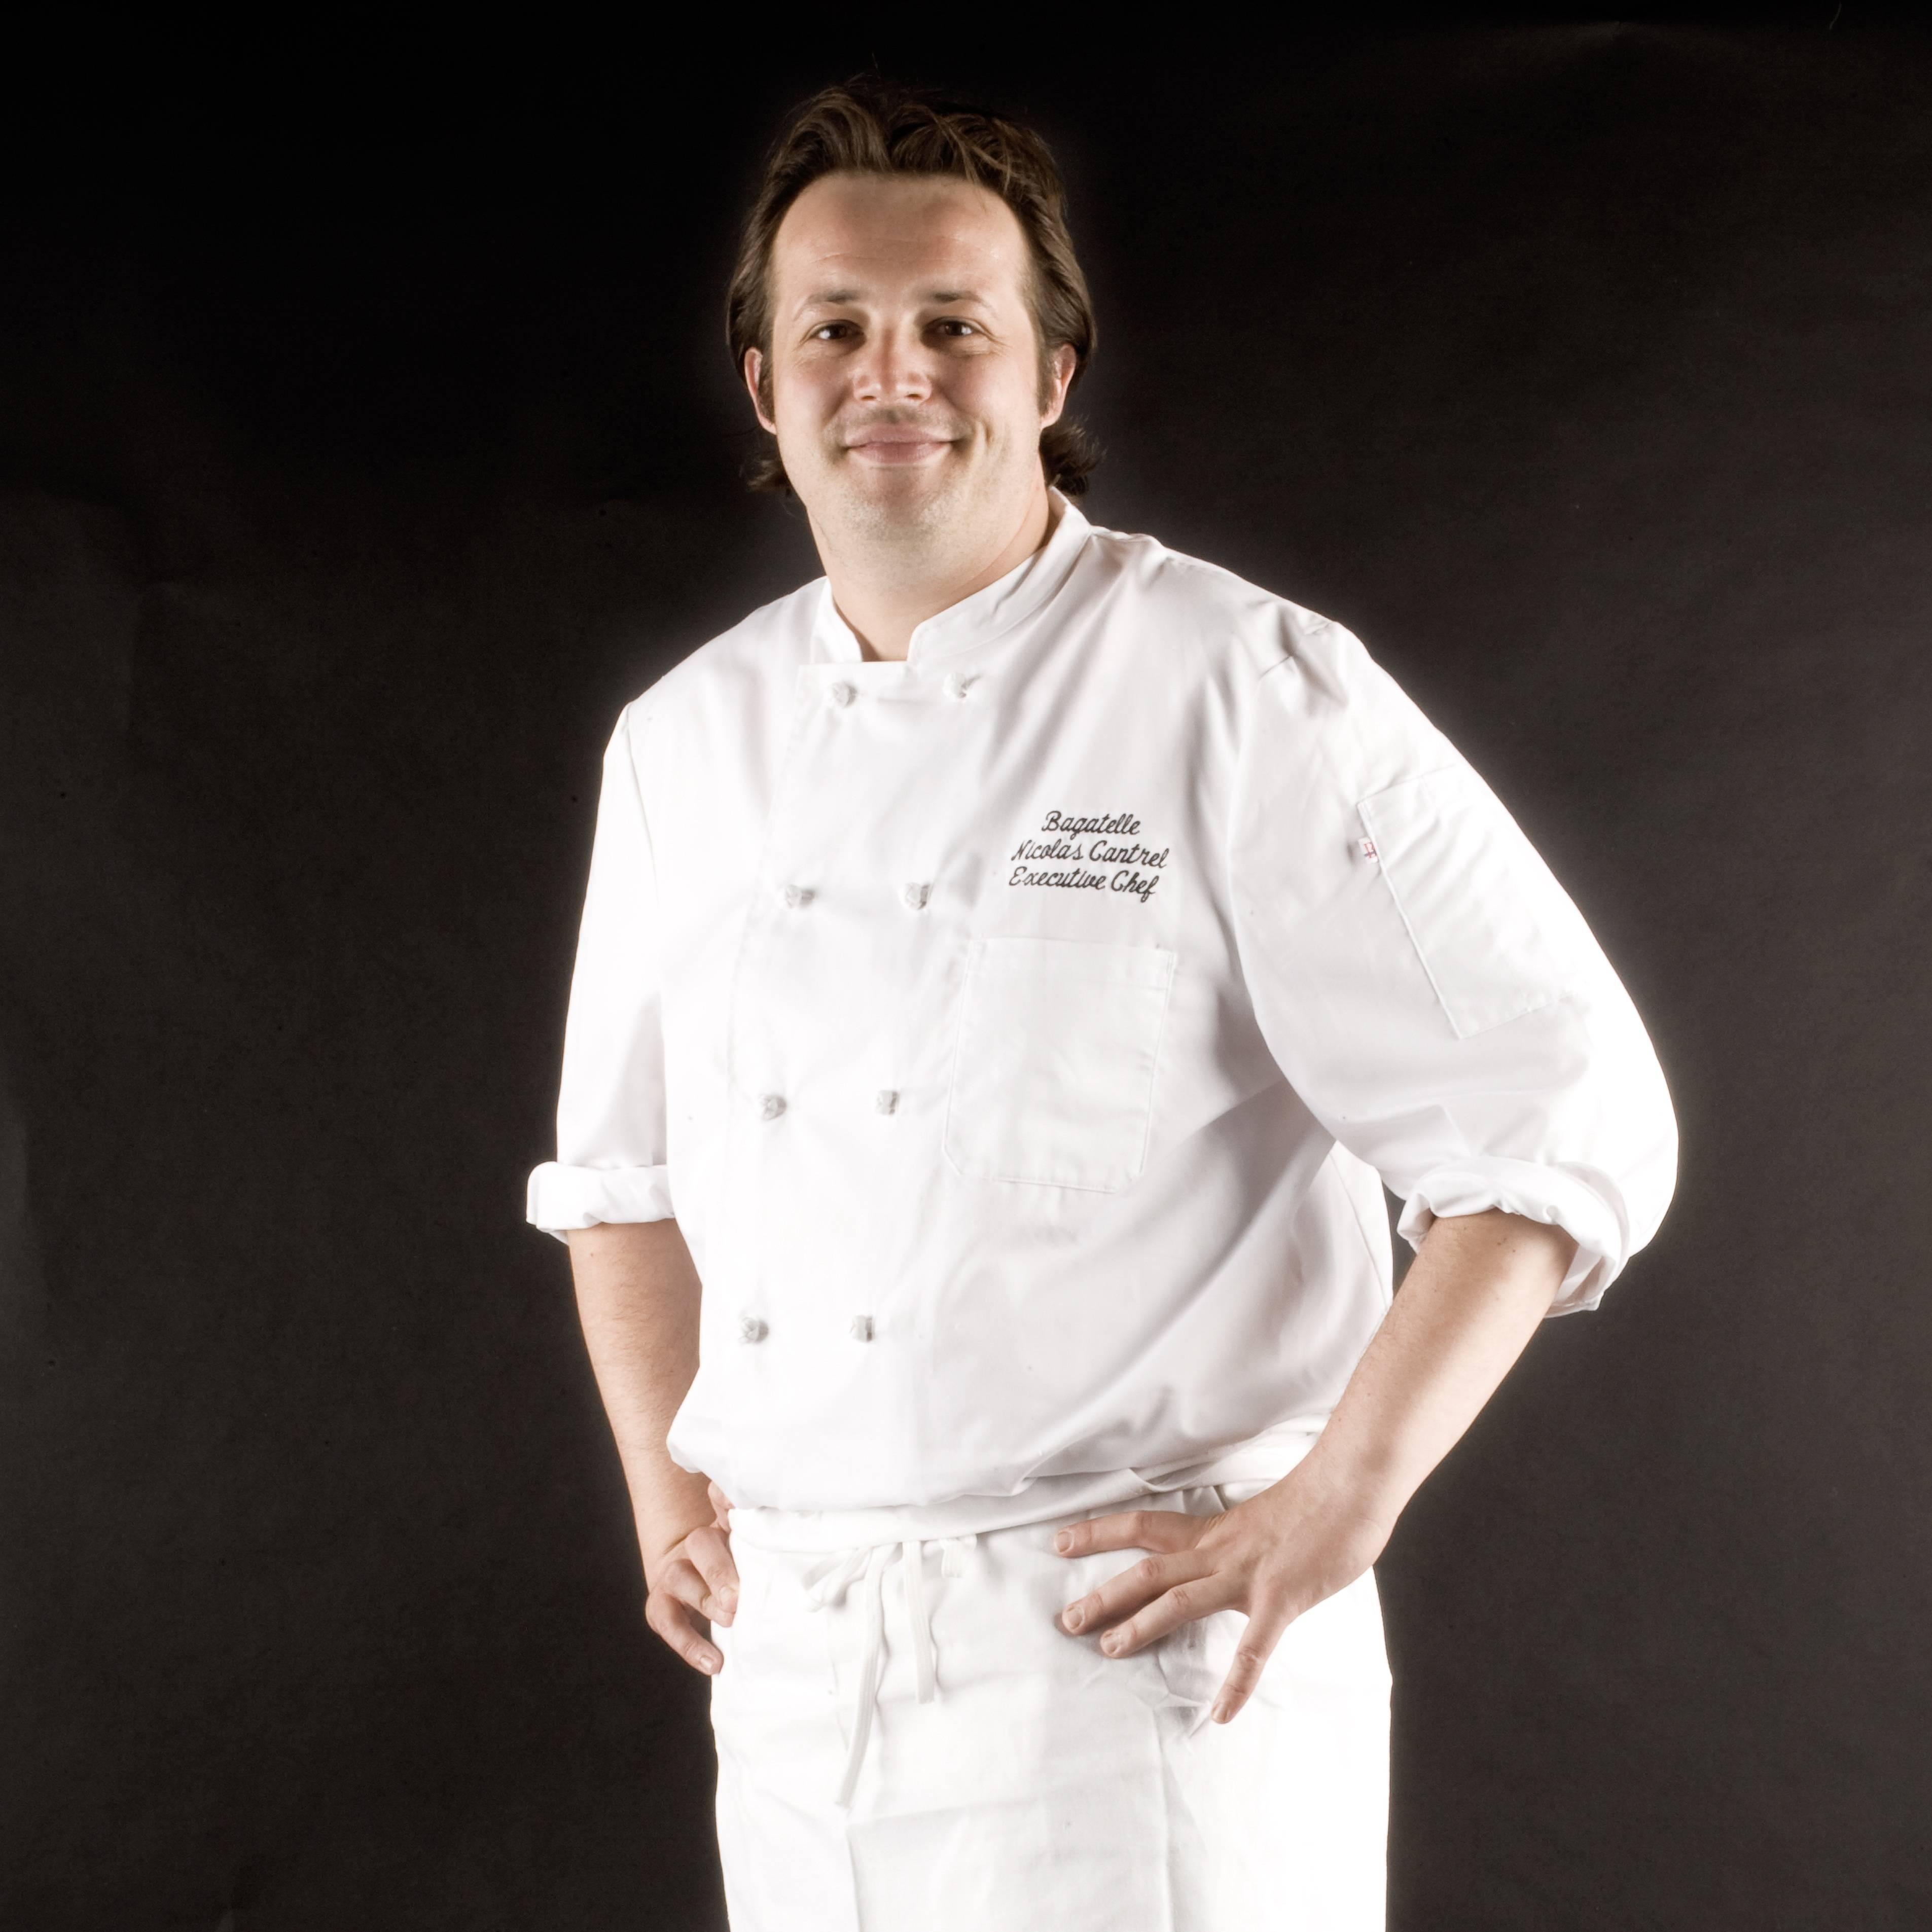 Executive Chef Nicolas Cantrel